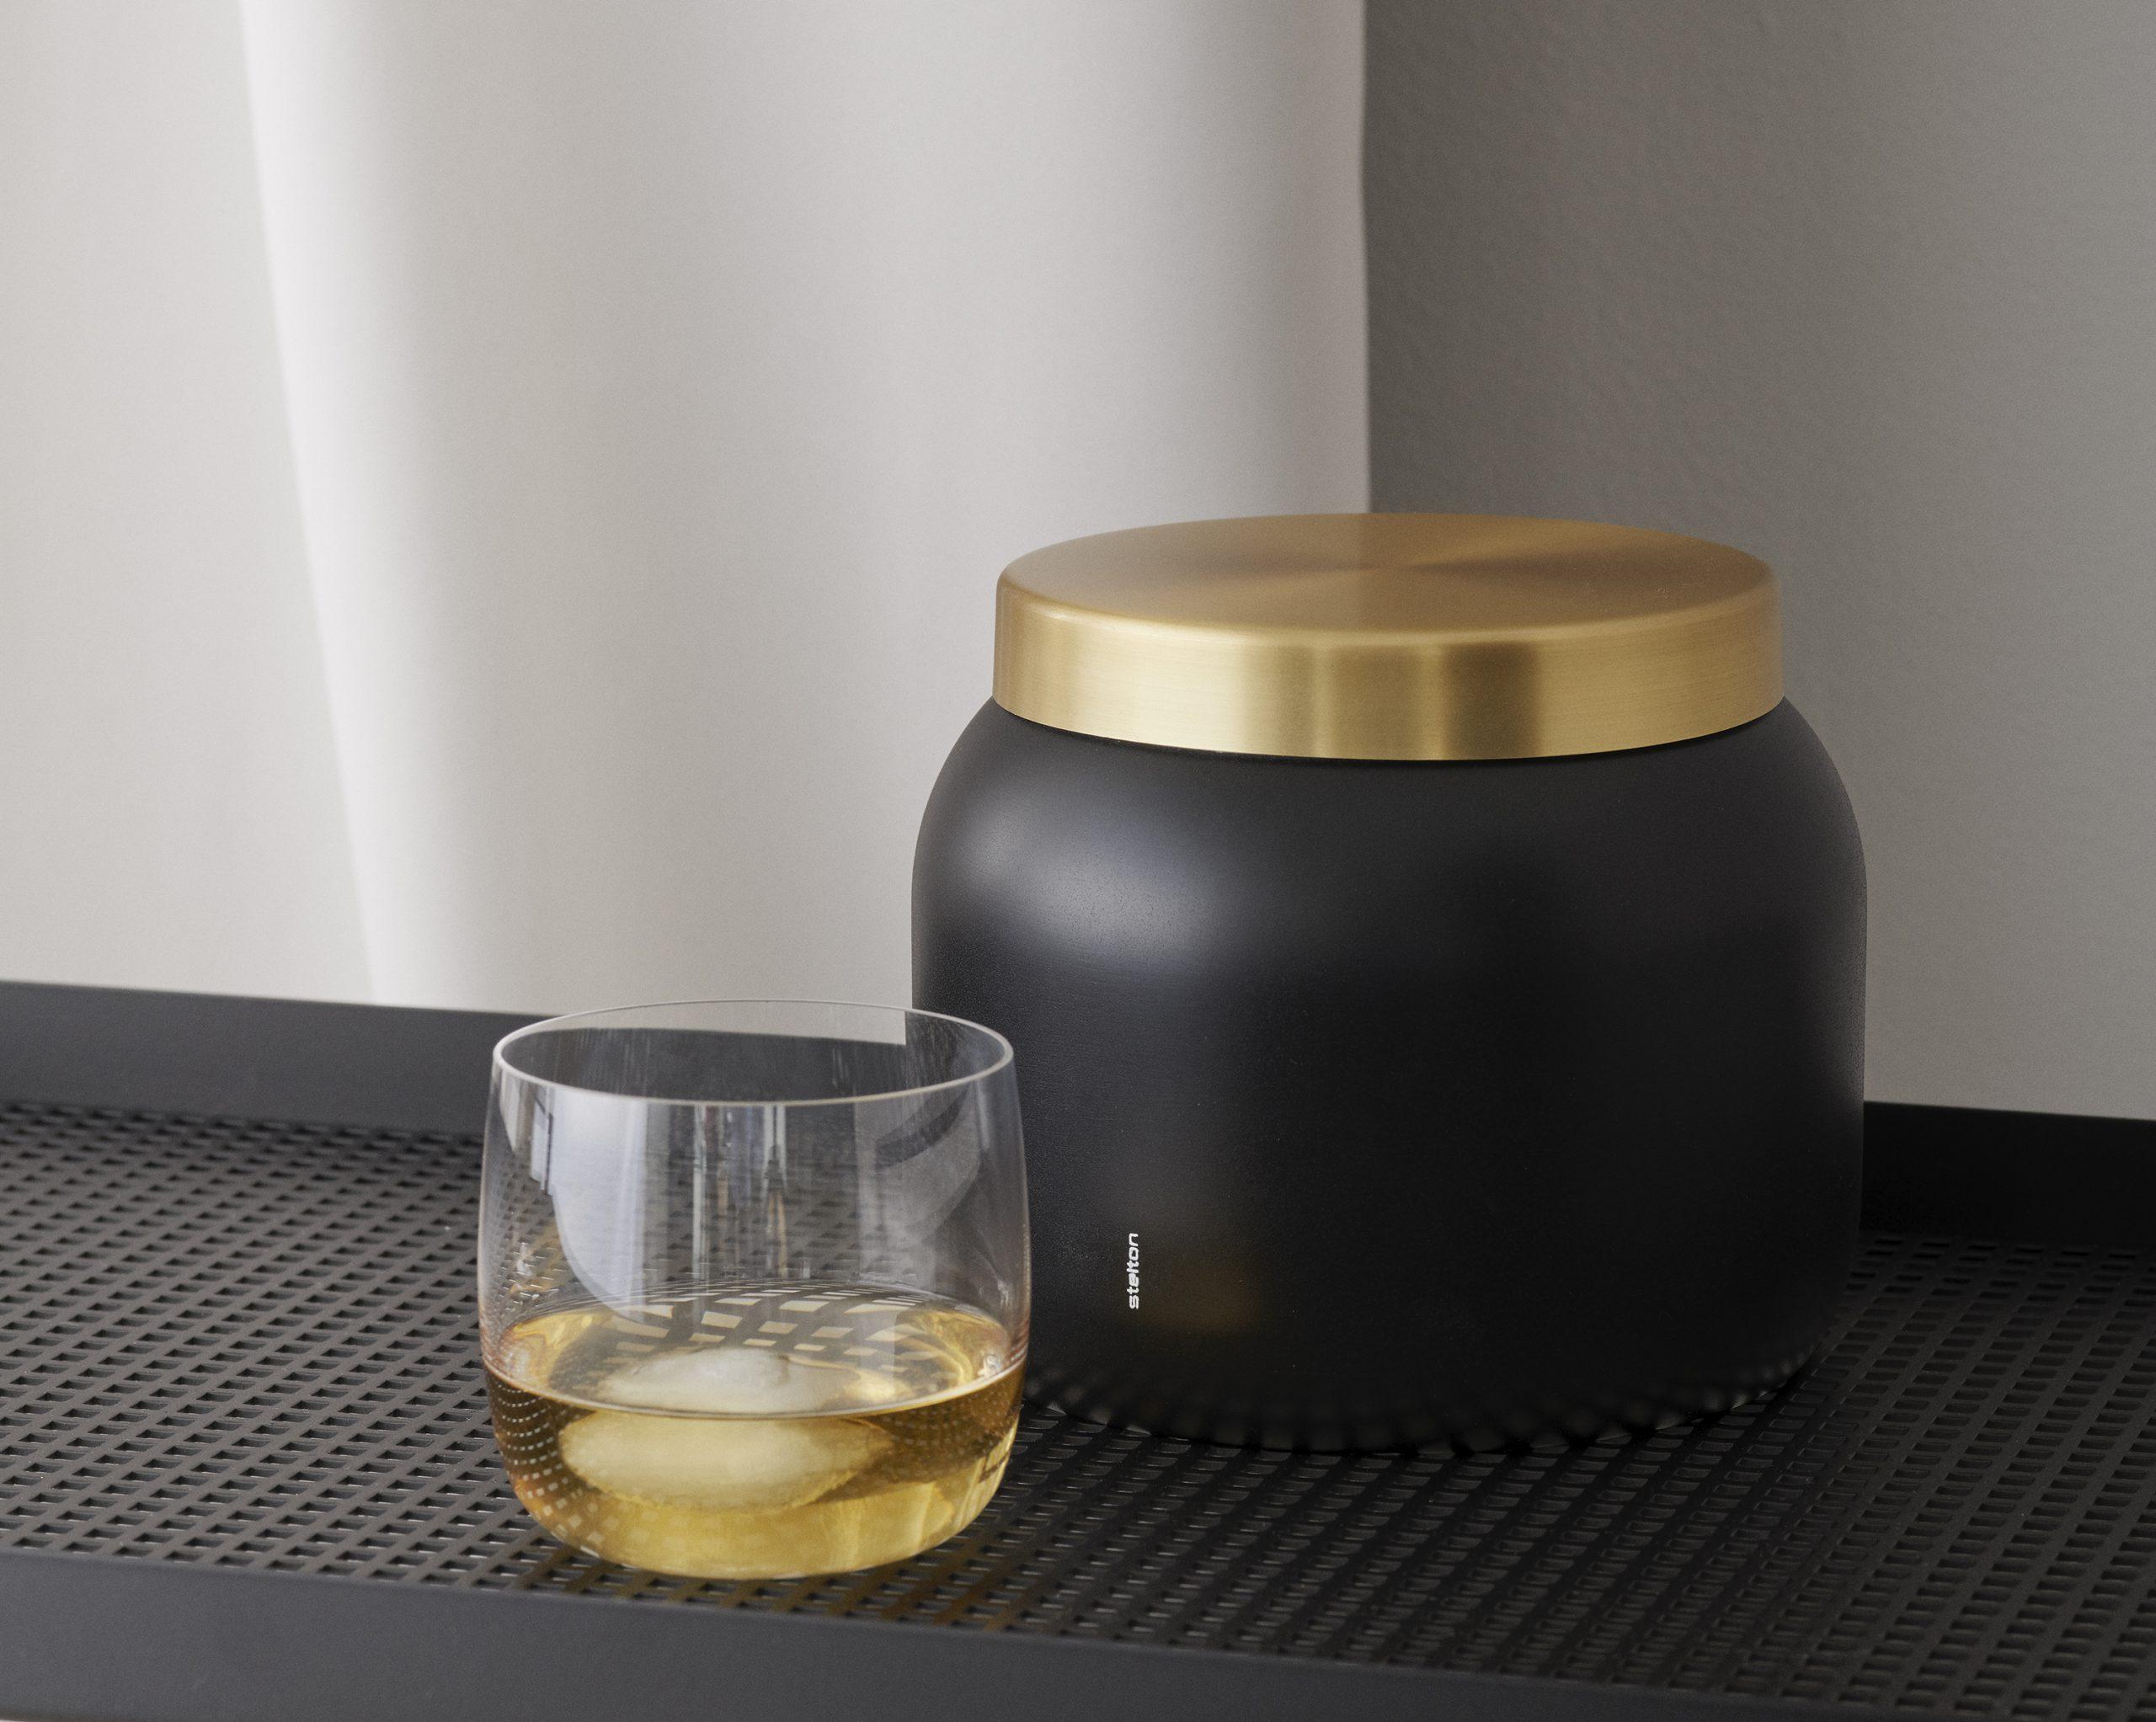 Collar Ice bucket by Debiasi Sandri for Stelton